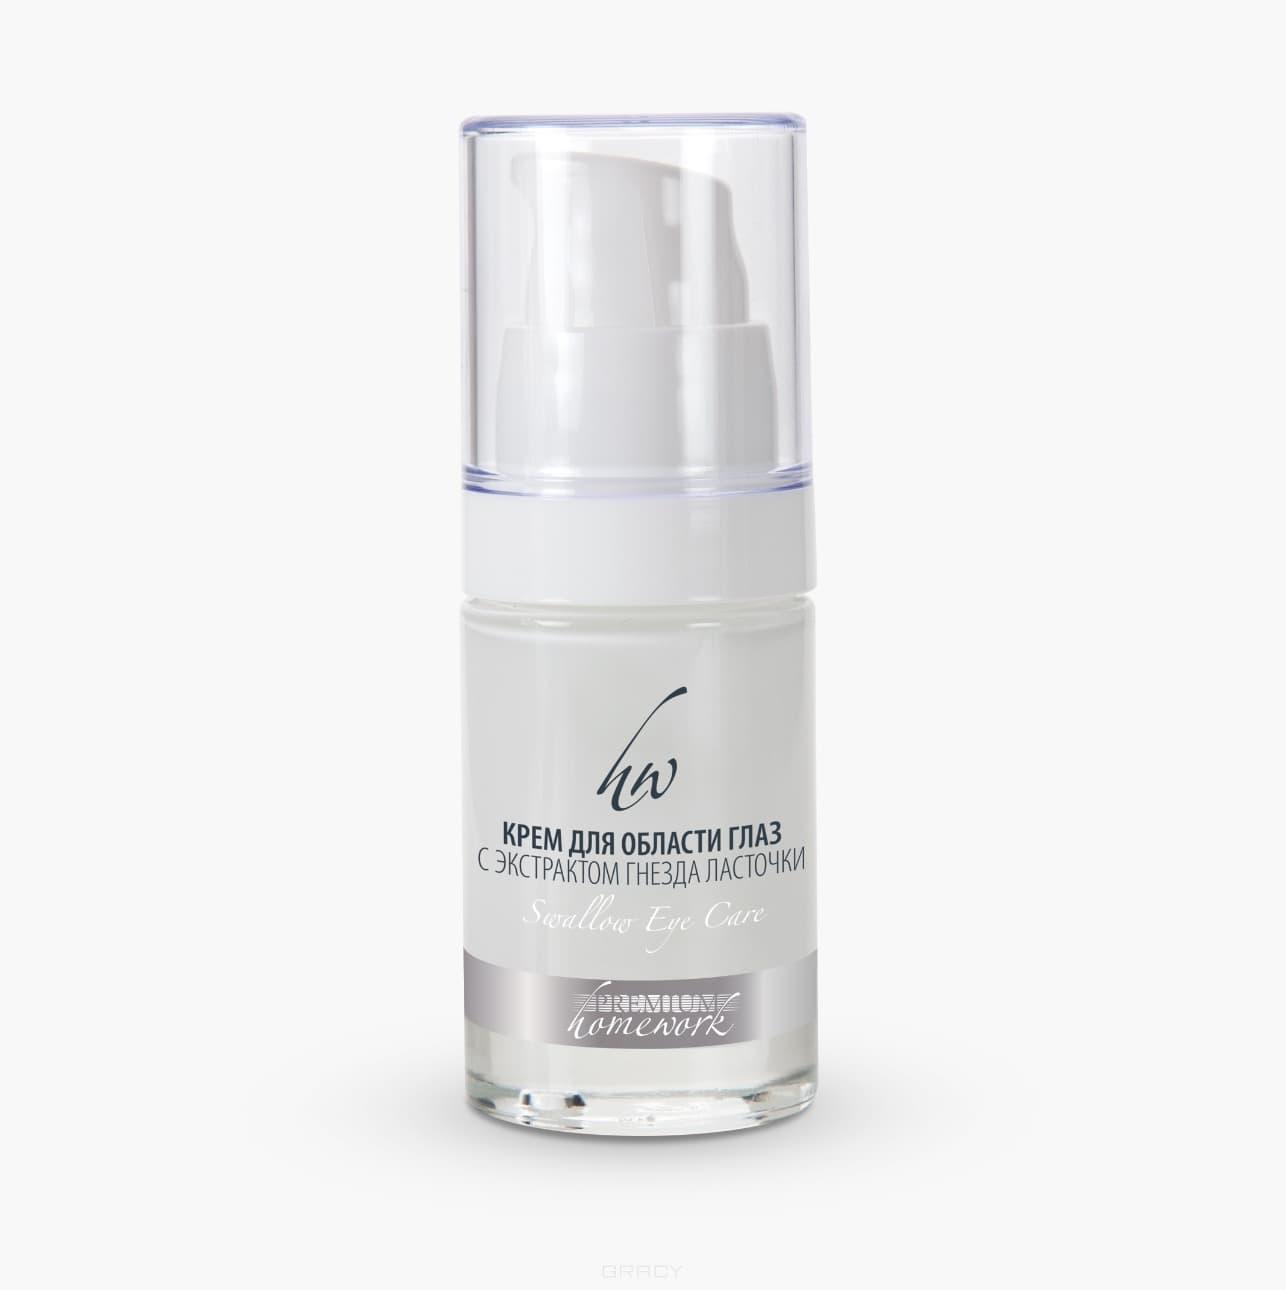 Premium, Крем для области глаз с экстрактом гнезда ласточки Swallow, 15 мл крем premium липо крем swallow night 50 мл